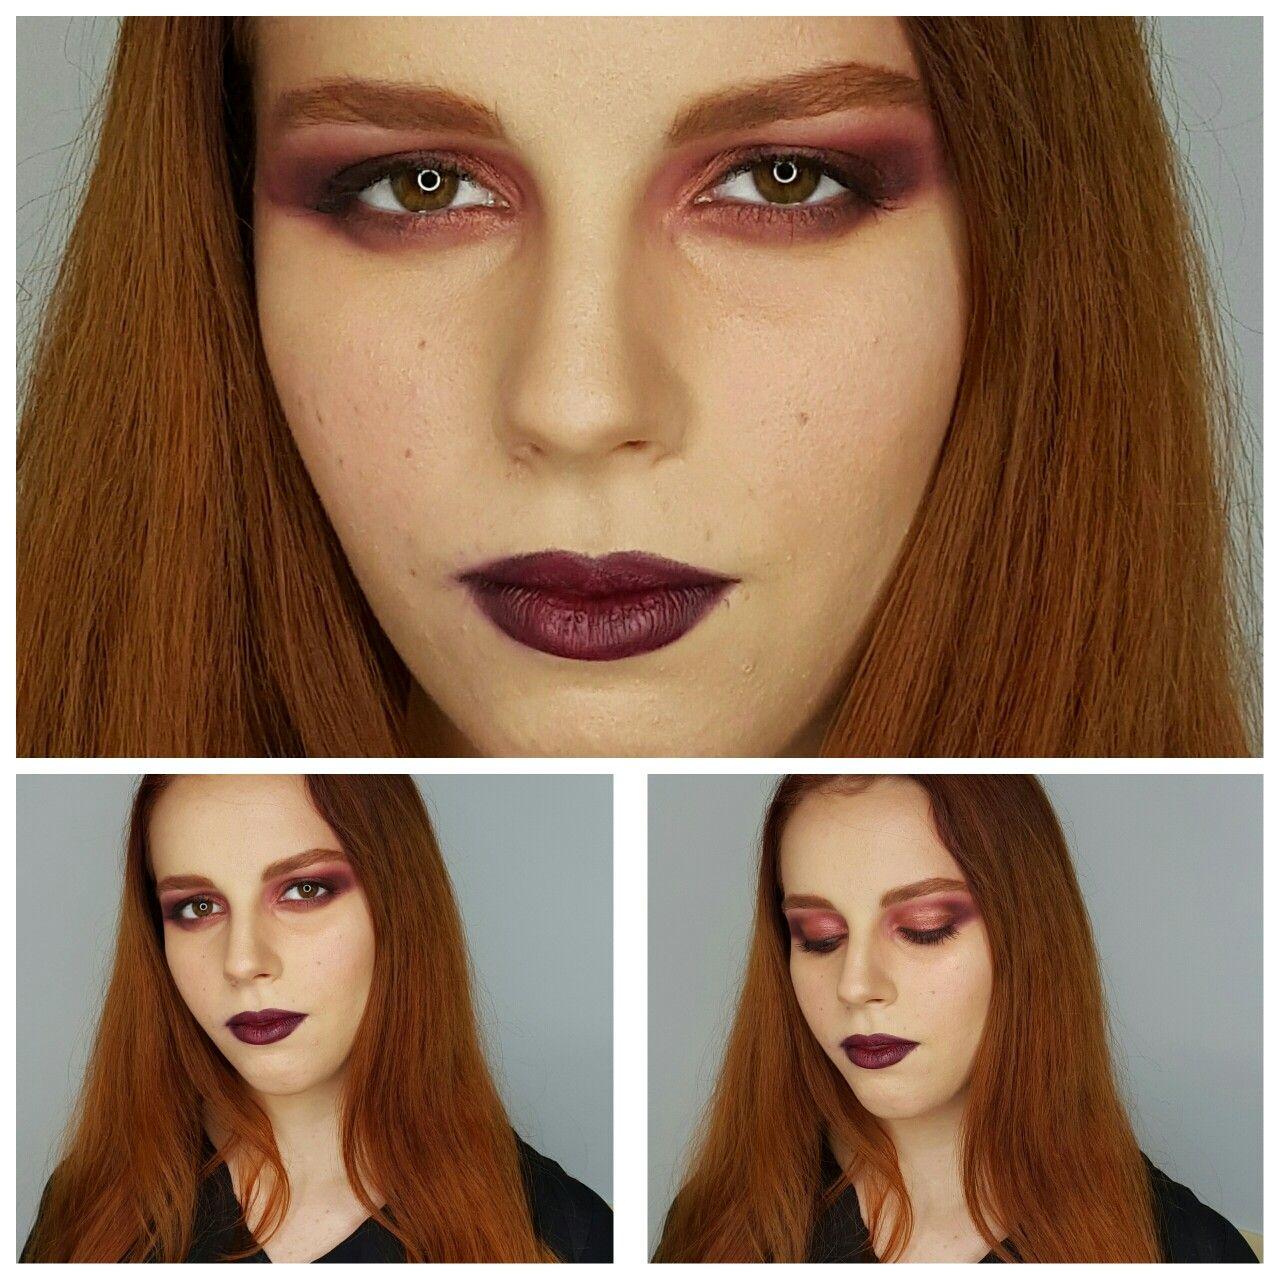 PASARELA  She Melissa Gala  #runway #makeup #beauty #kryolan #fashion #shine #borravino #cobre #contouring #intense #night